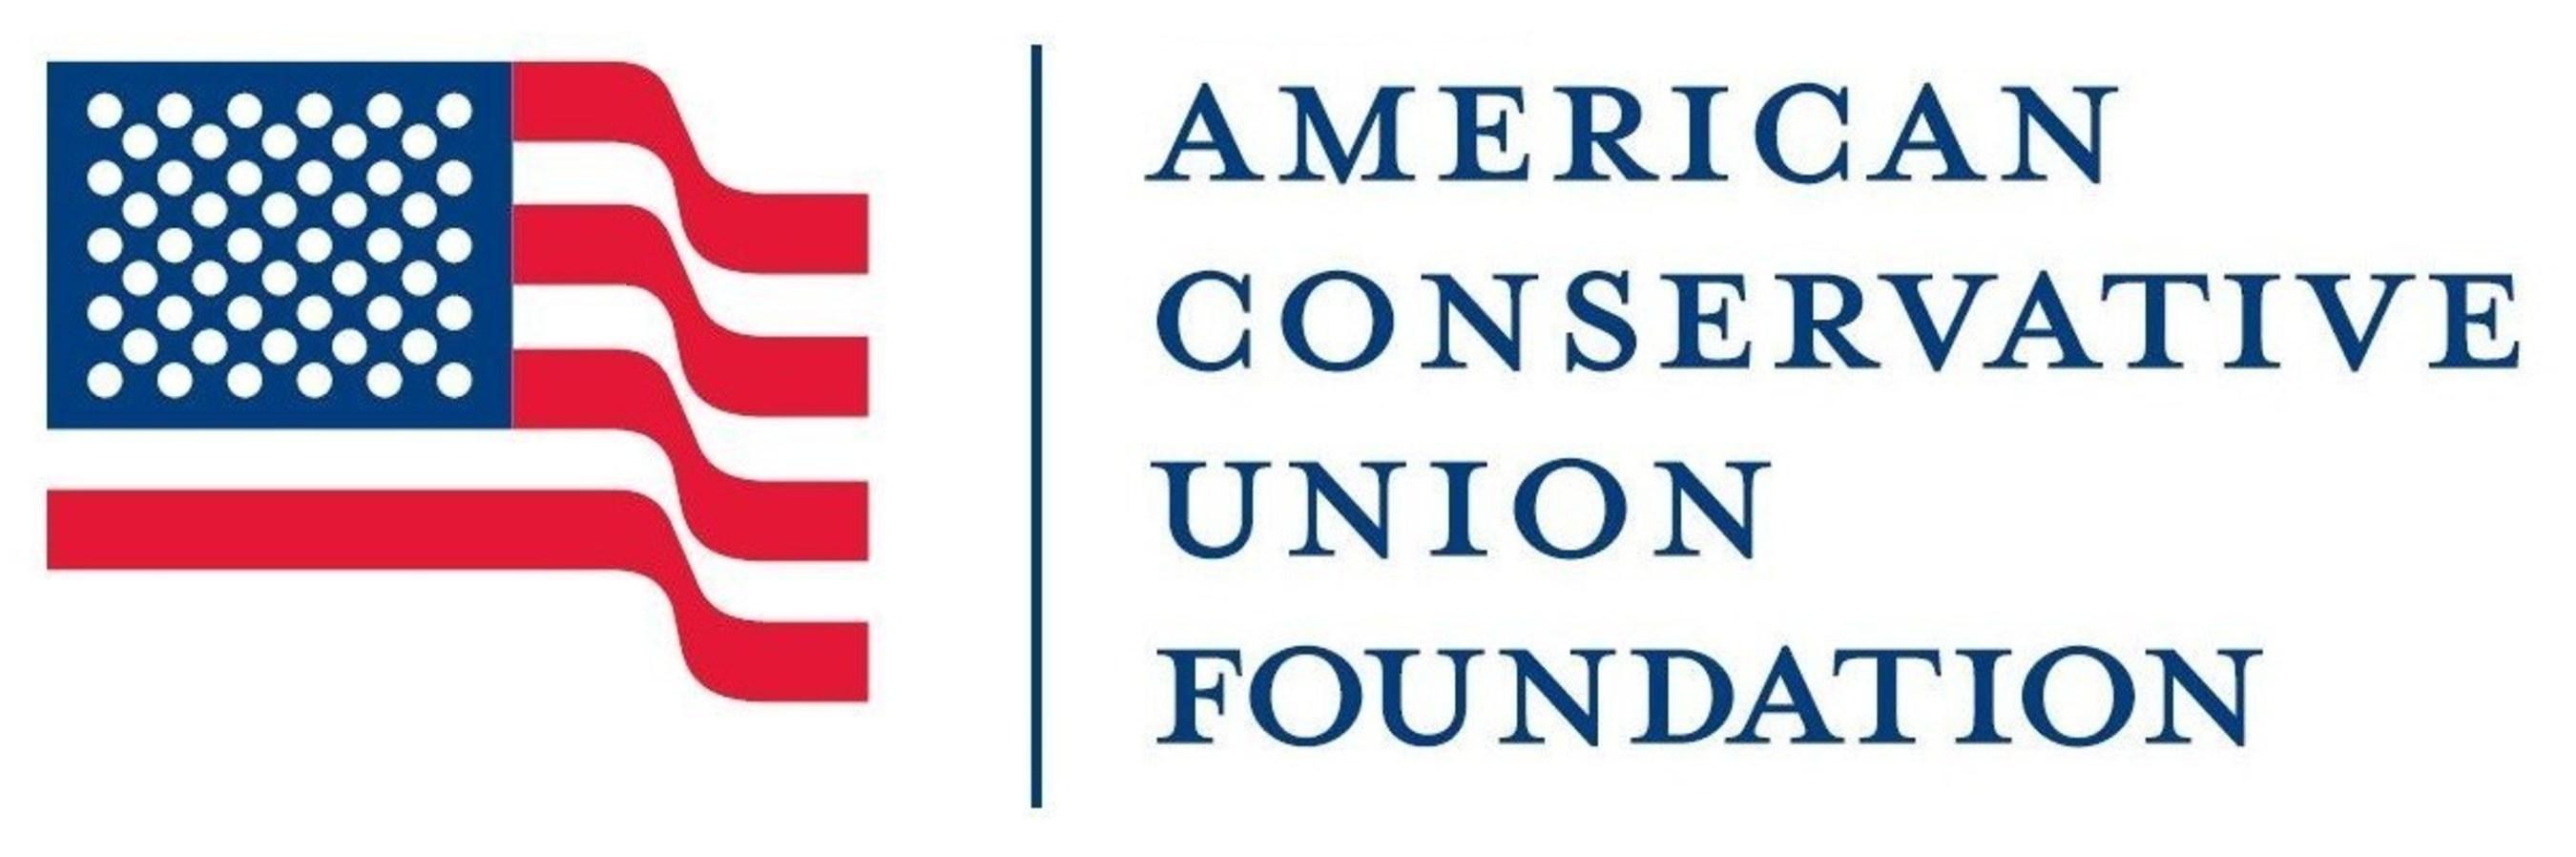 American Conservative Union Foundation logo (PRNewsFoto/American Conservative Union)